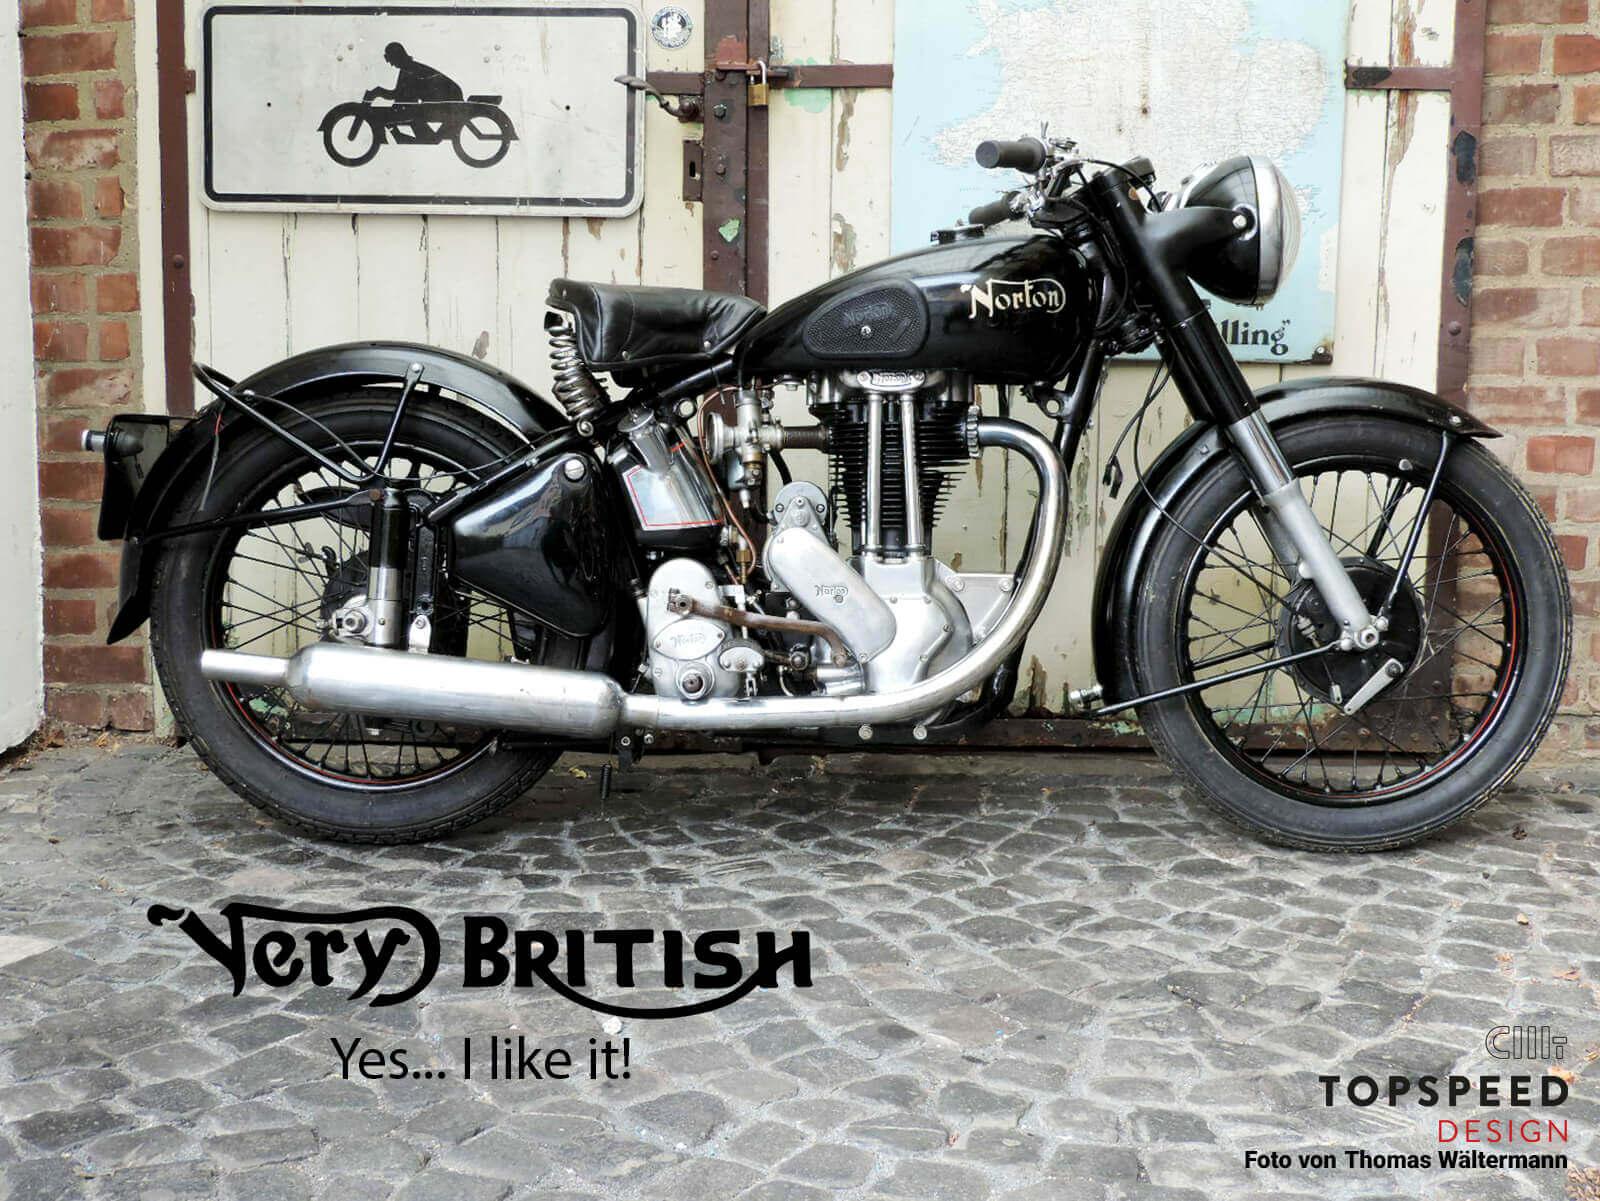 Very British Yes...I like it! | Topspeed-Design by Bernhard Schmidt